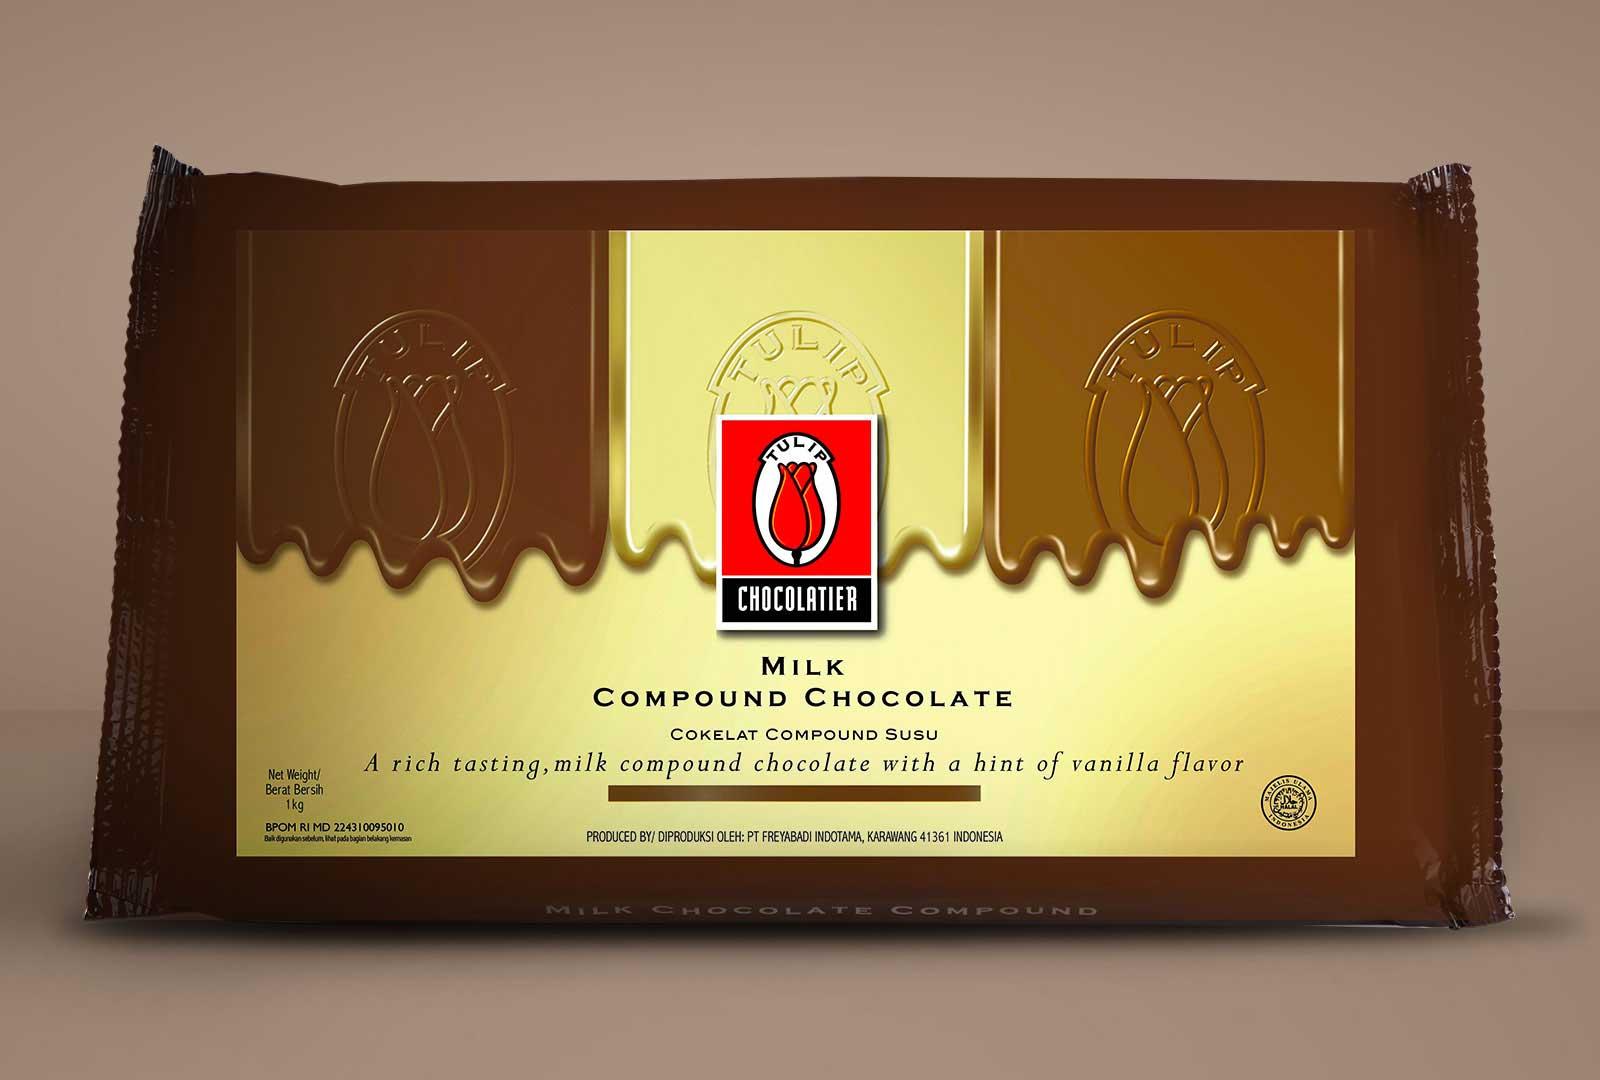 milk-Chocolate-Compound-front-1